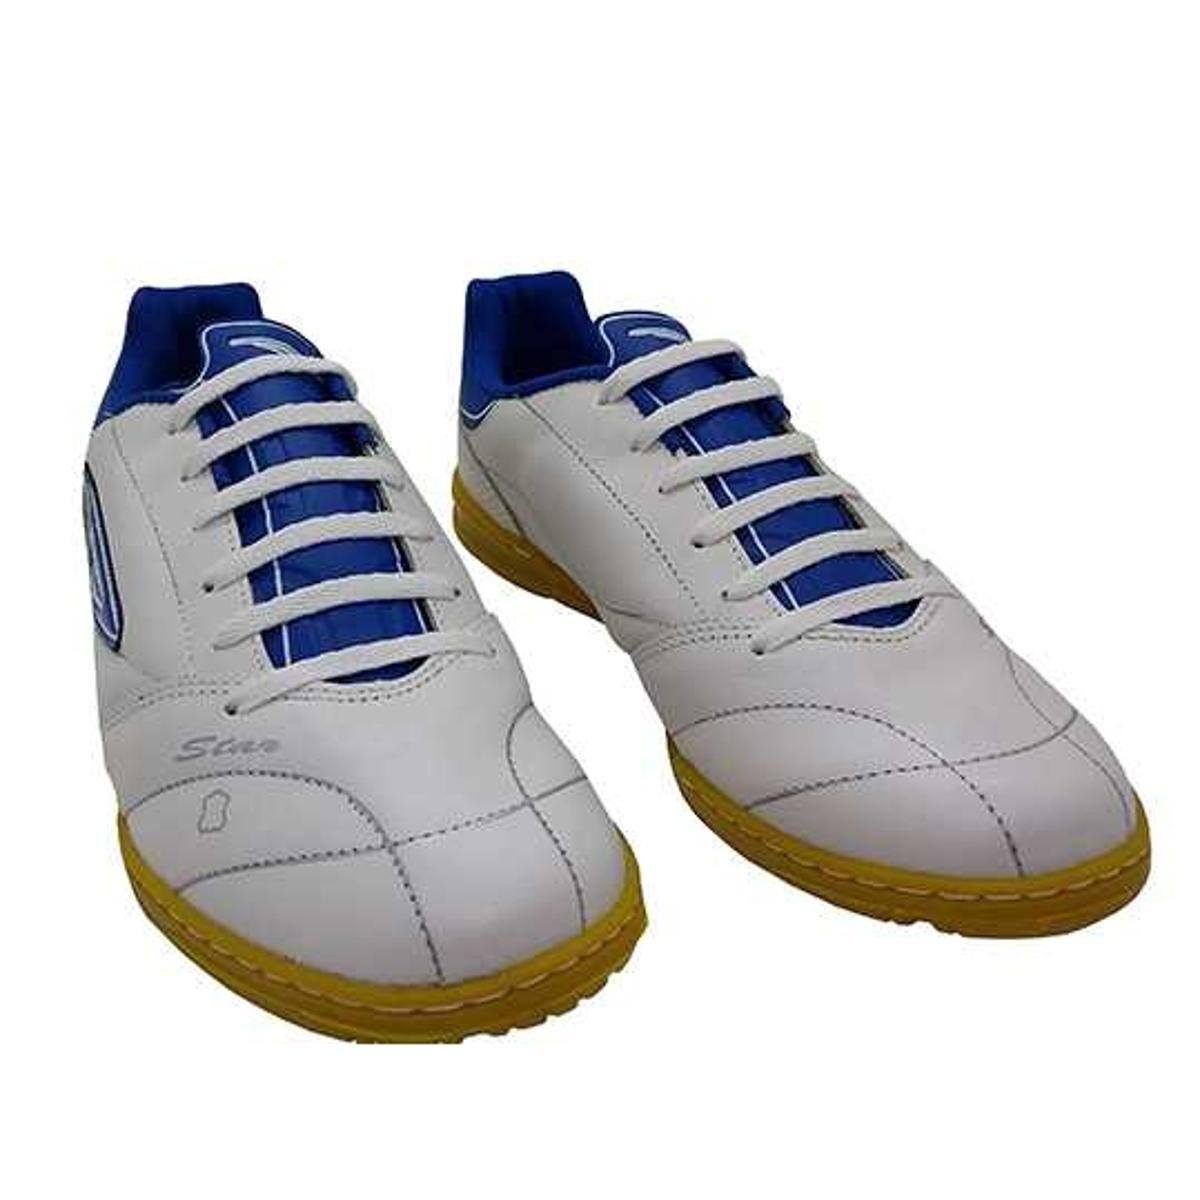 Chuteira Futsal Diavolo Star Couro Masculina - Branco e Azul ... 6bc742b0414f9